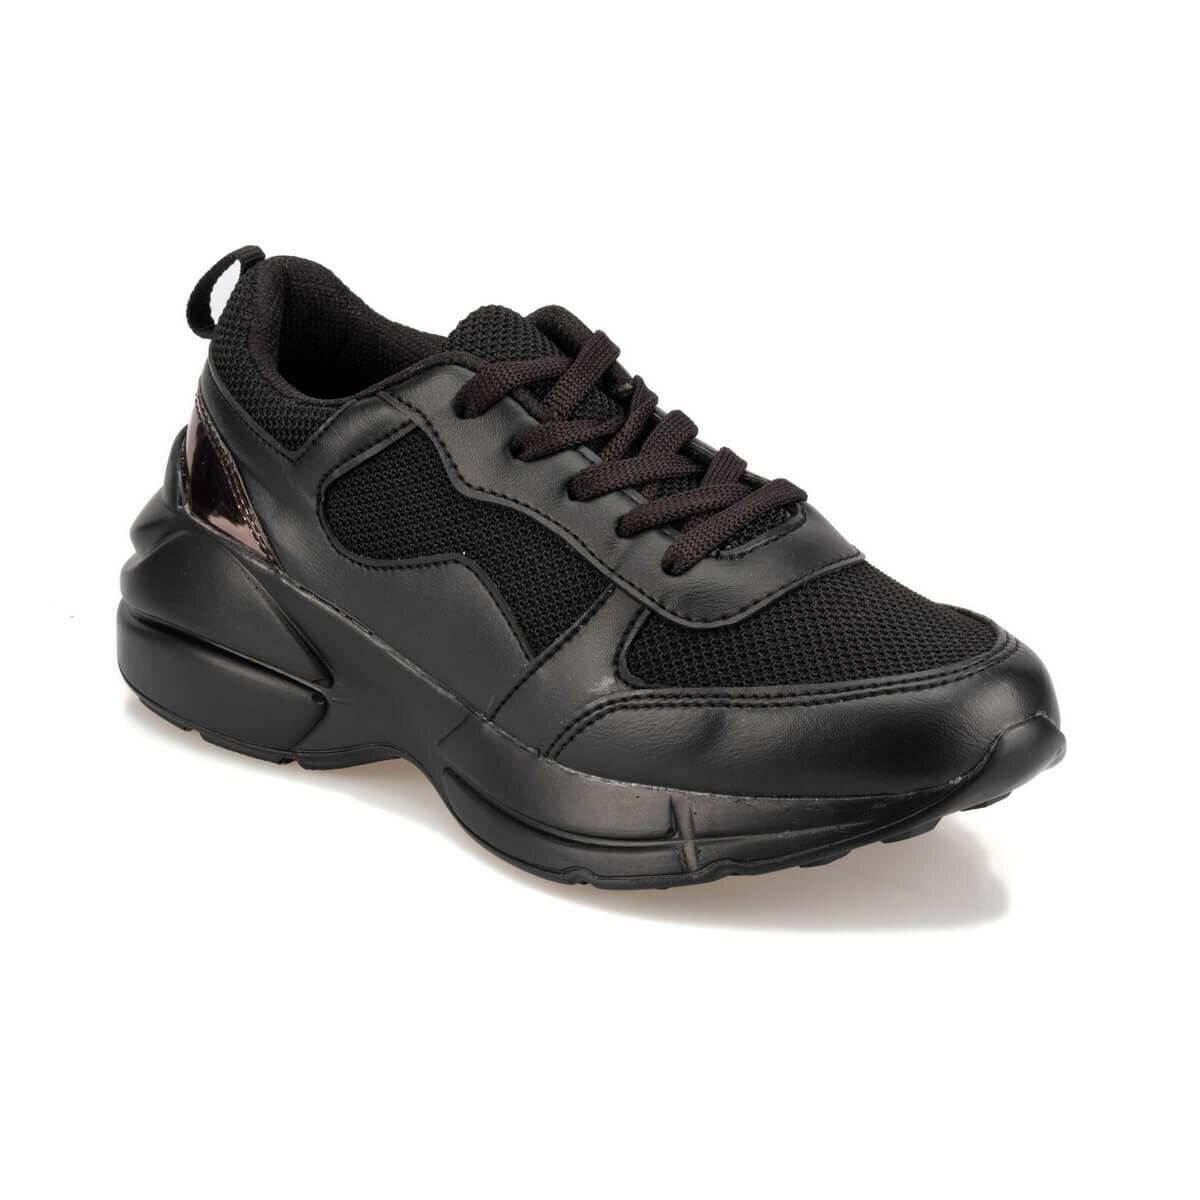 FLO 92.314726.Z Black Women Sneaker Polaris